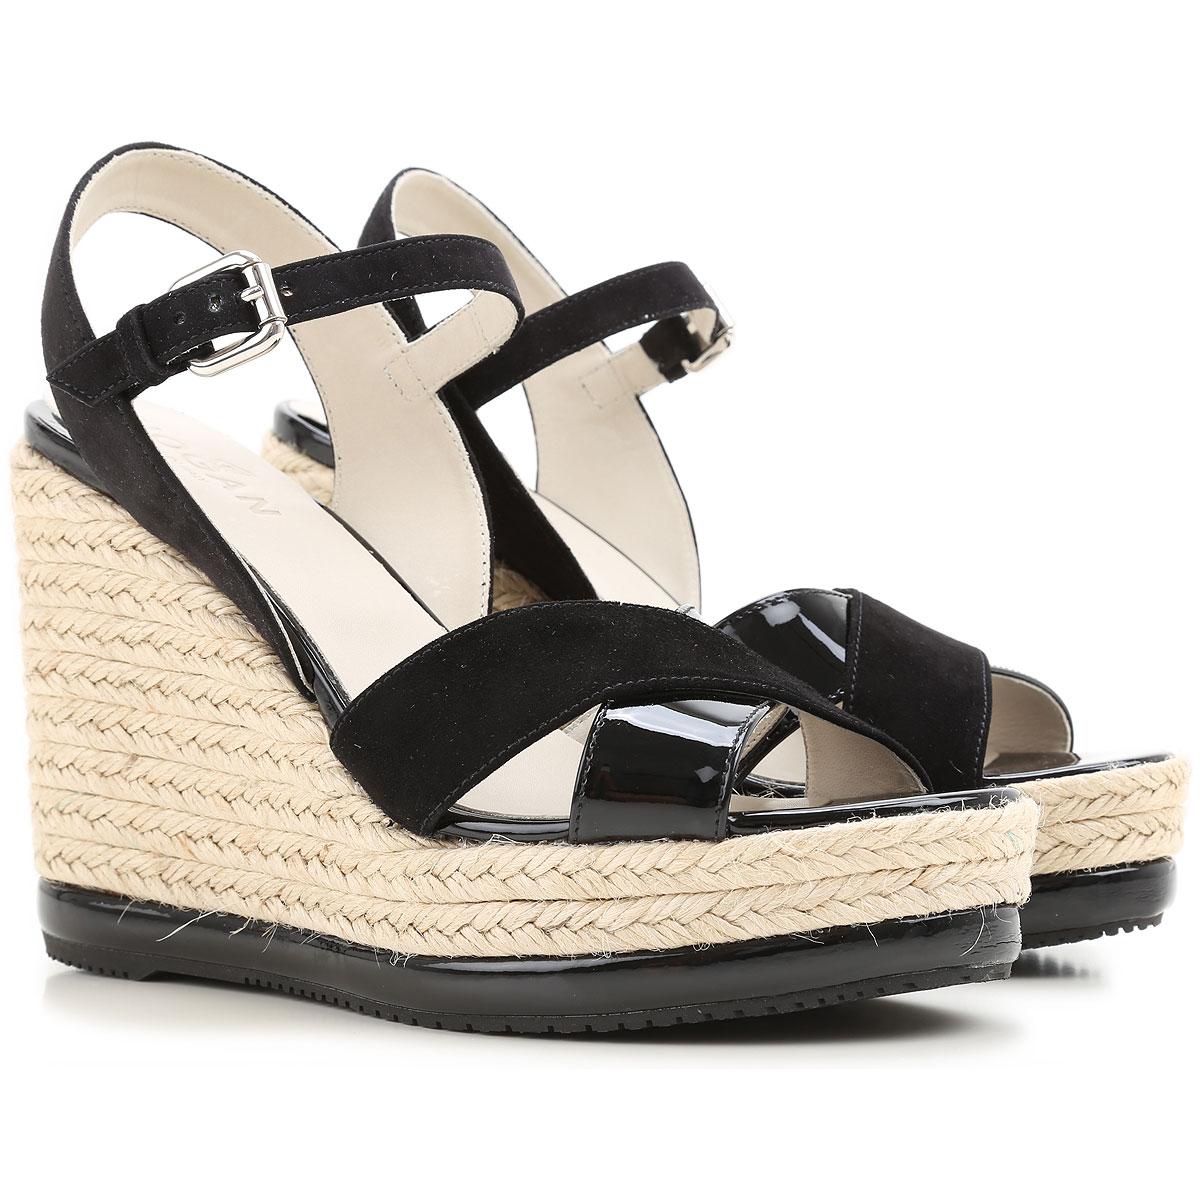 chaussures femme hogan code produit hxw2860r4602idb999. Black Bedroom Furniture Sets. Home Design Ideas